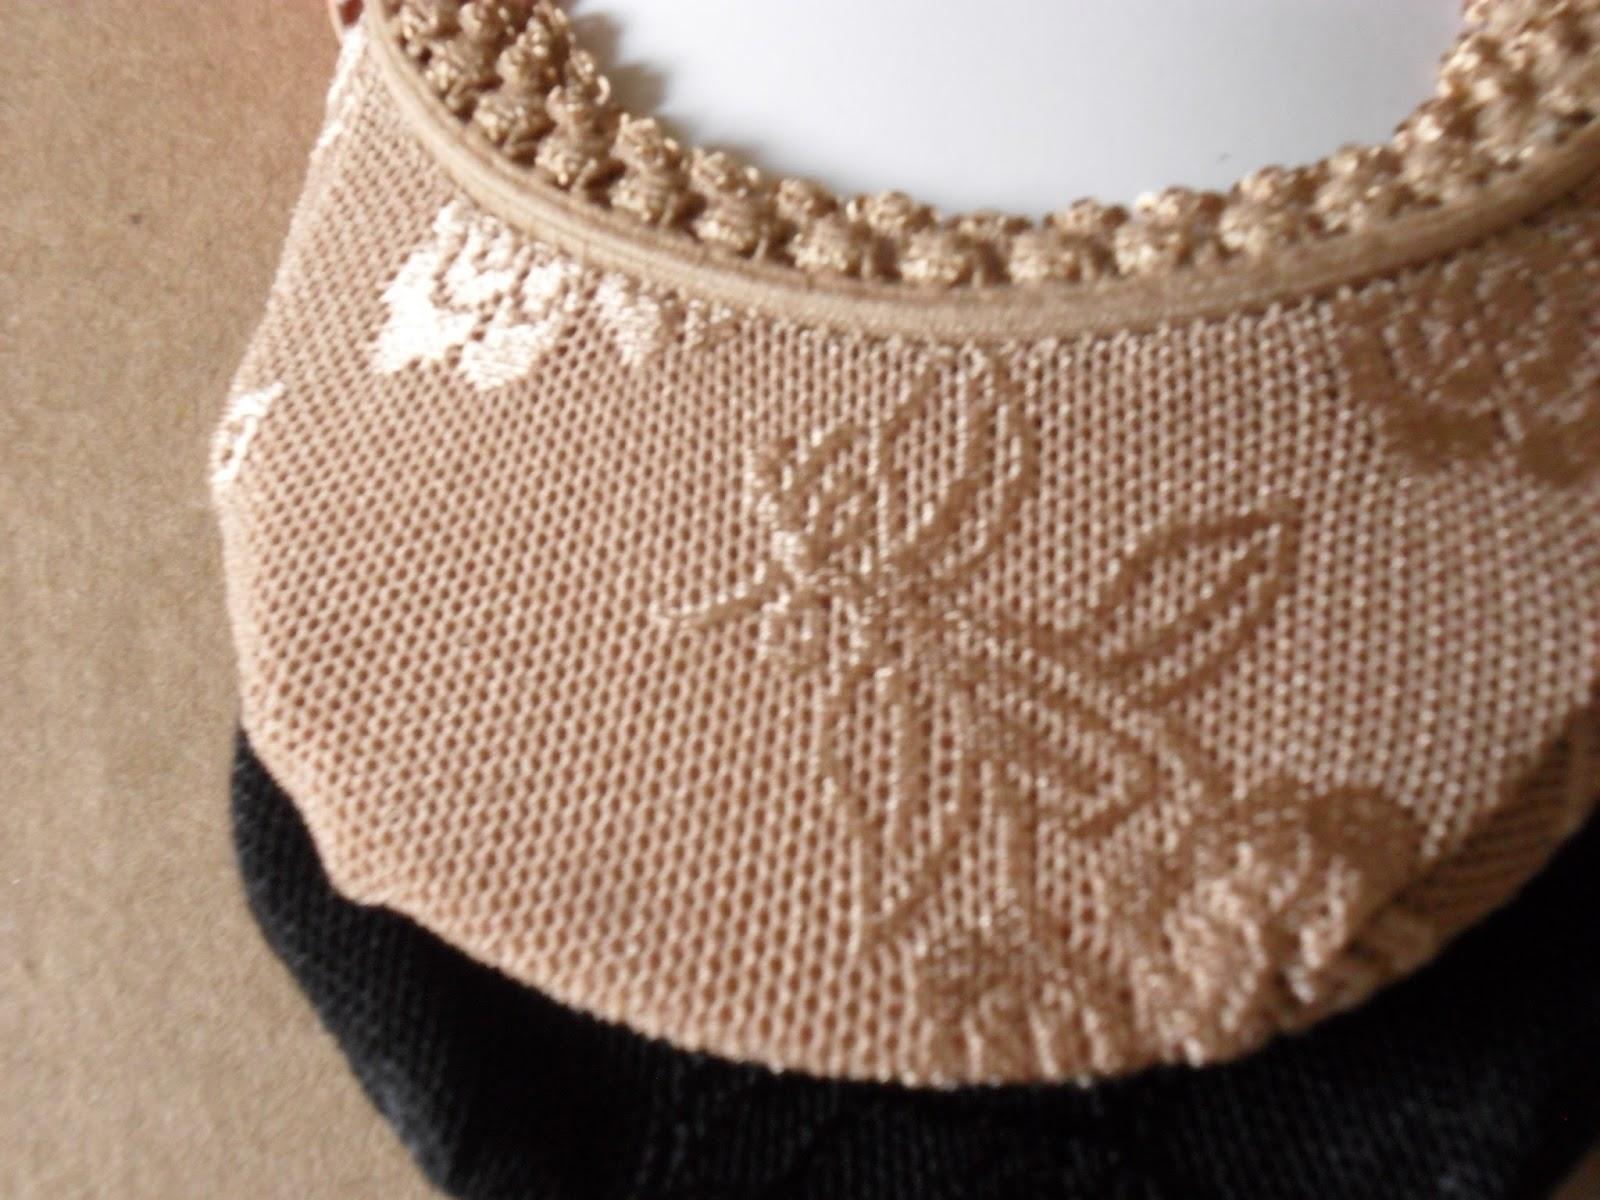 Kushyfoot, more than socks: a fashion statement. Review